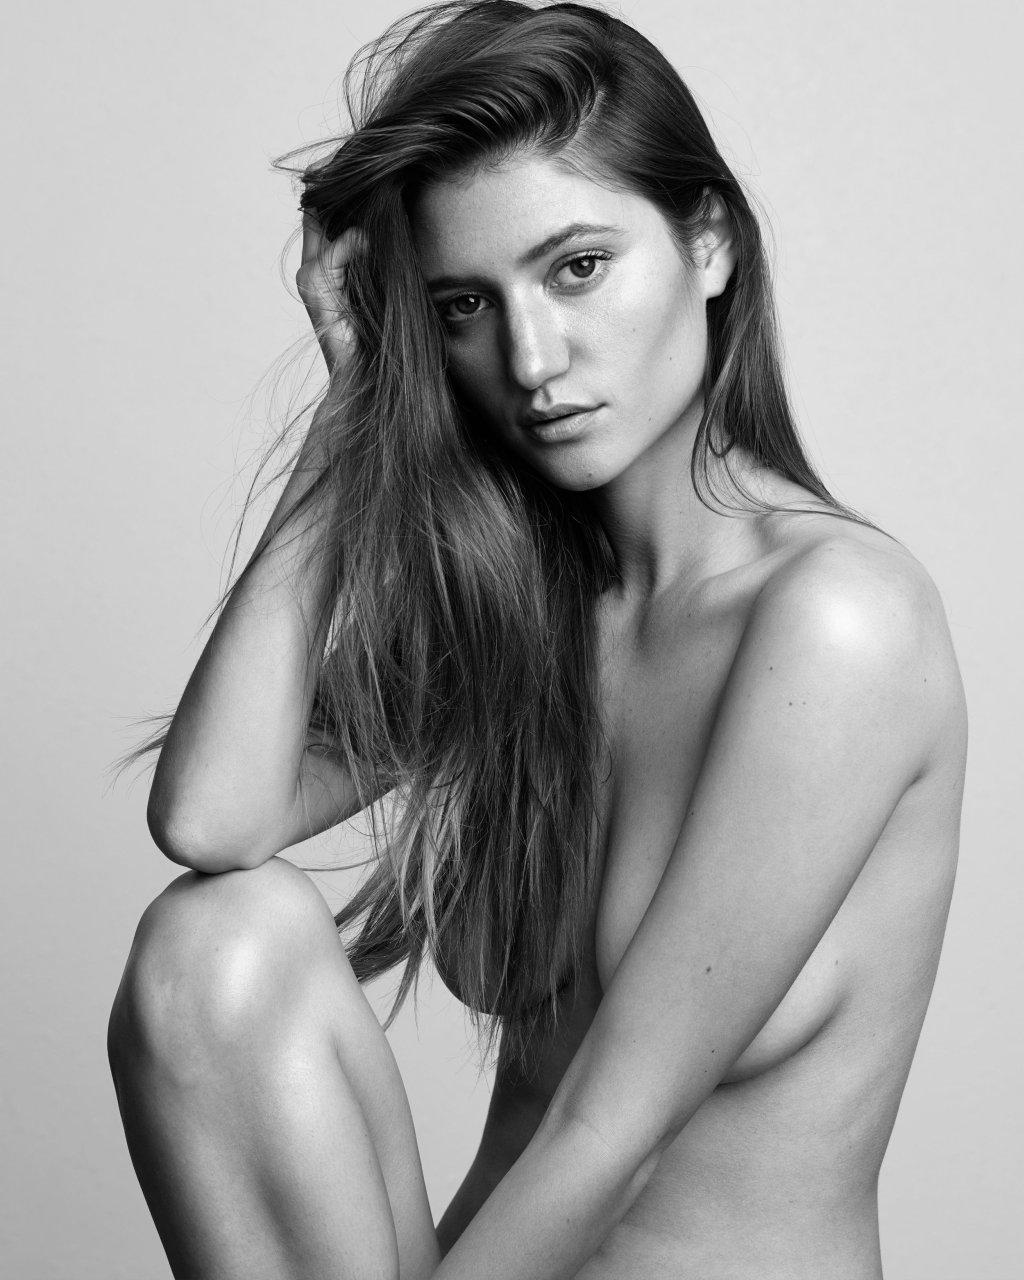 Maggie gyllenhaal nude 2 strip search - 3 part 5